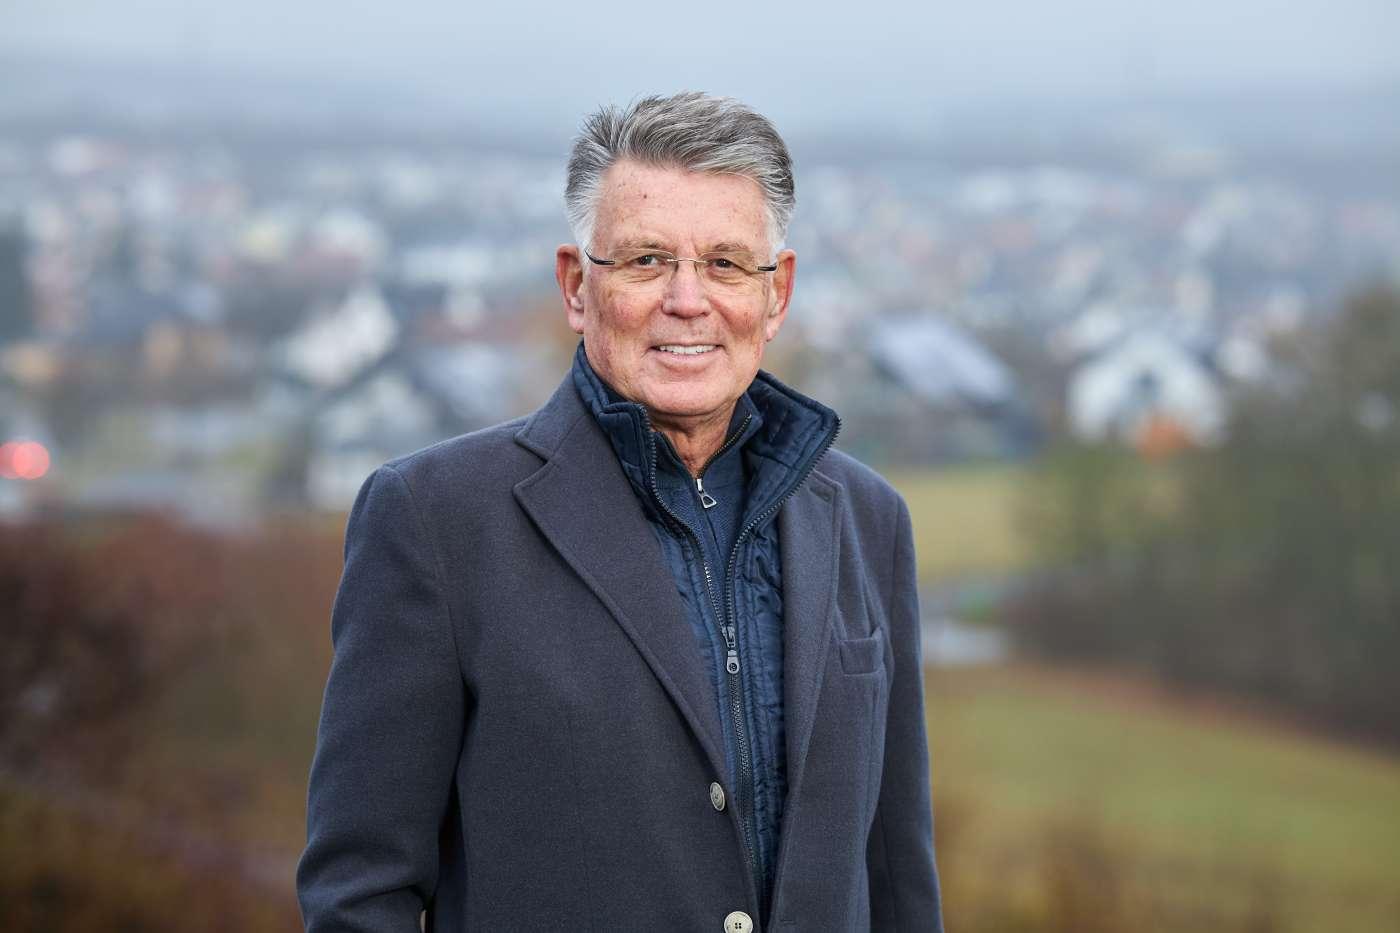 Dr. Simon Fulda